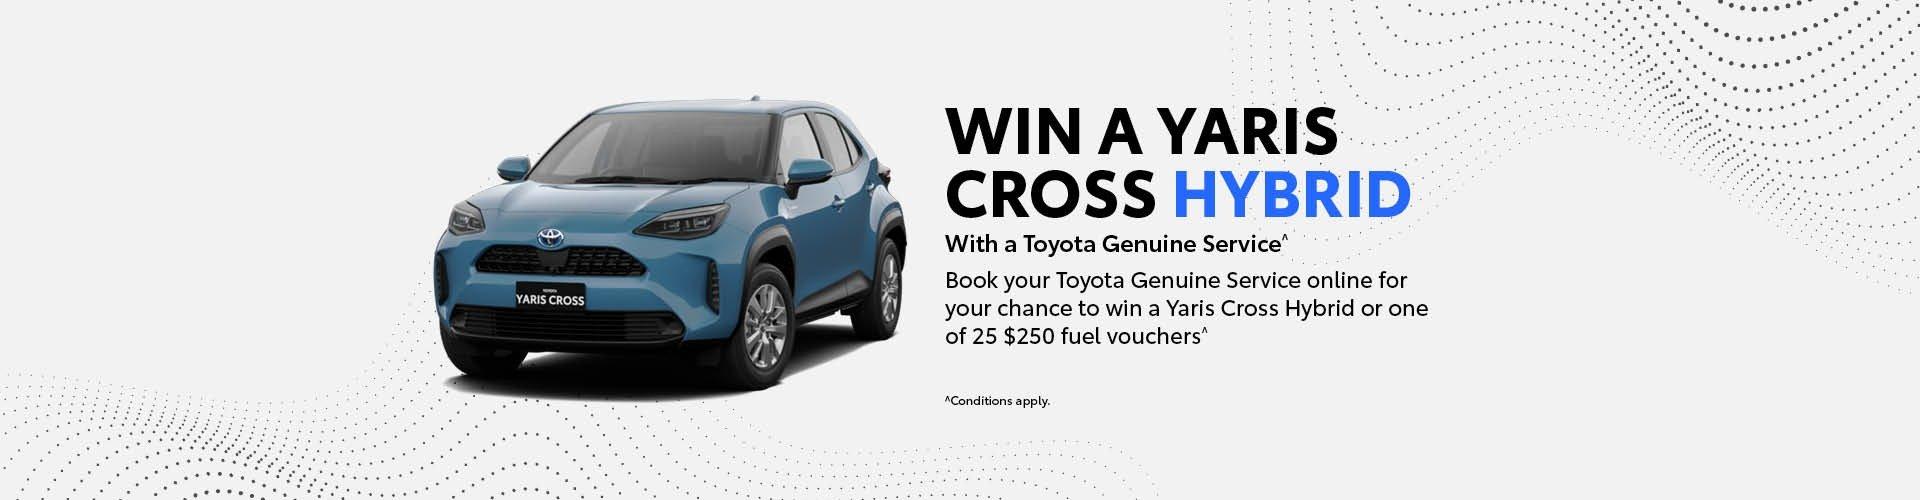 Werribee Toyota - Win a Yaris Cross